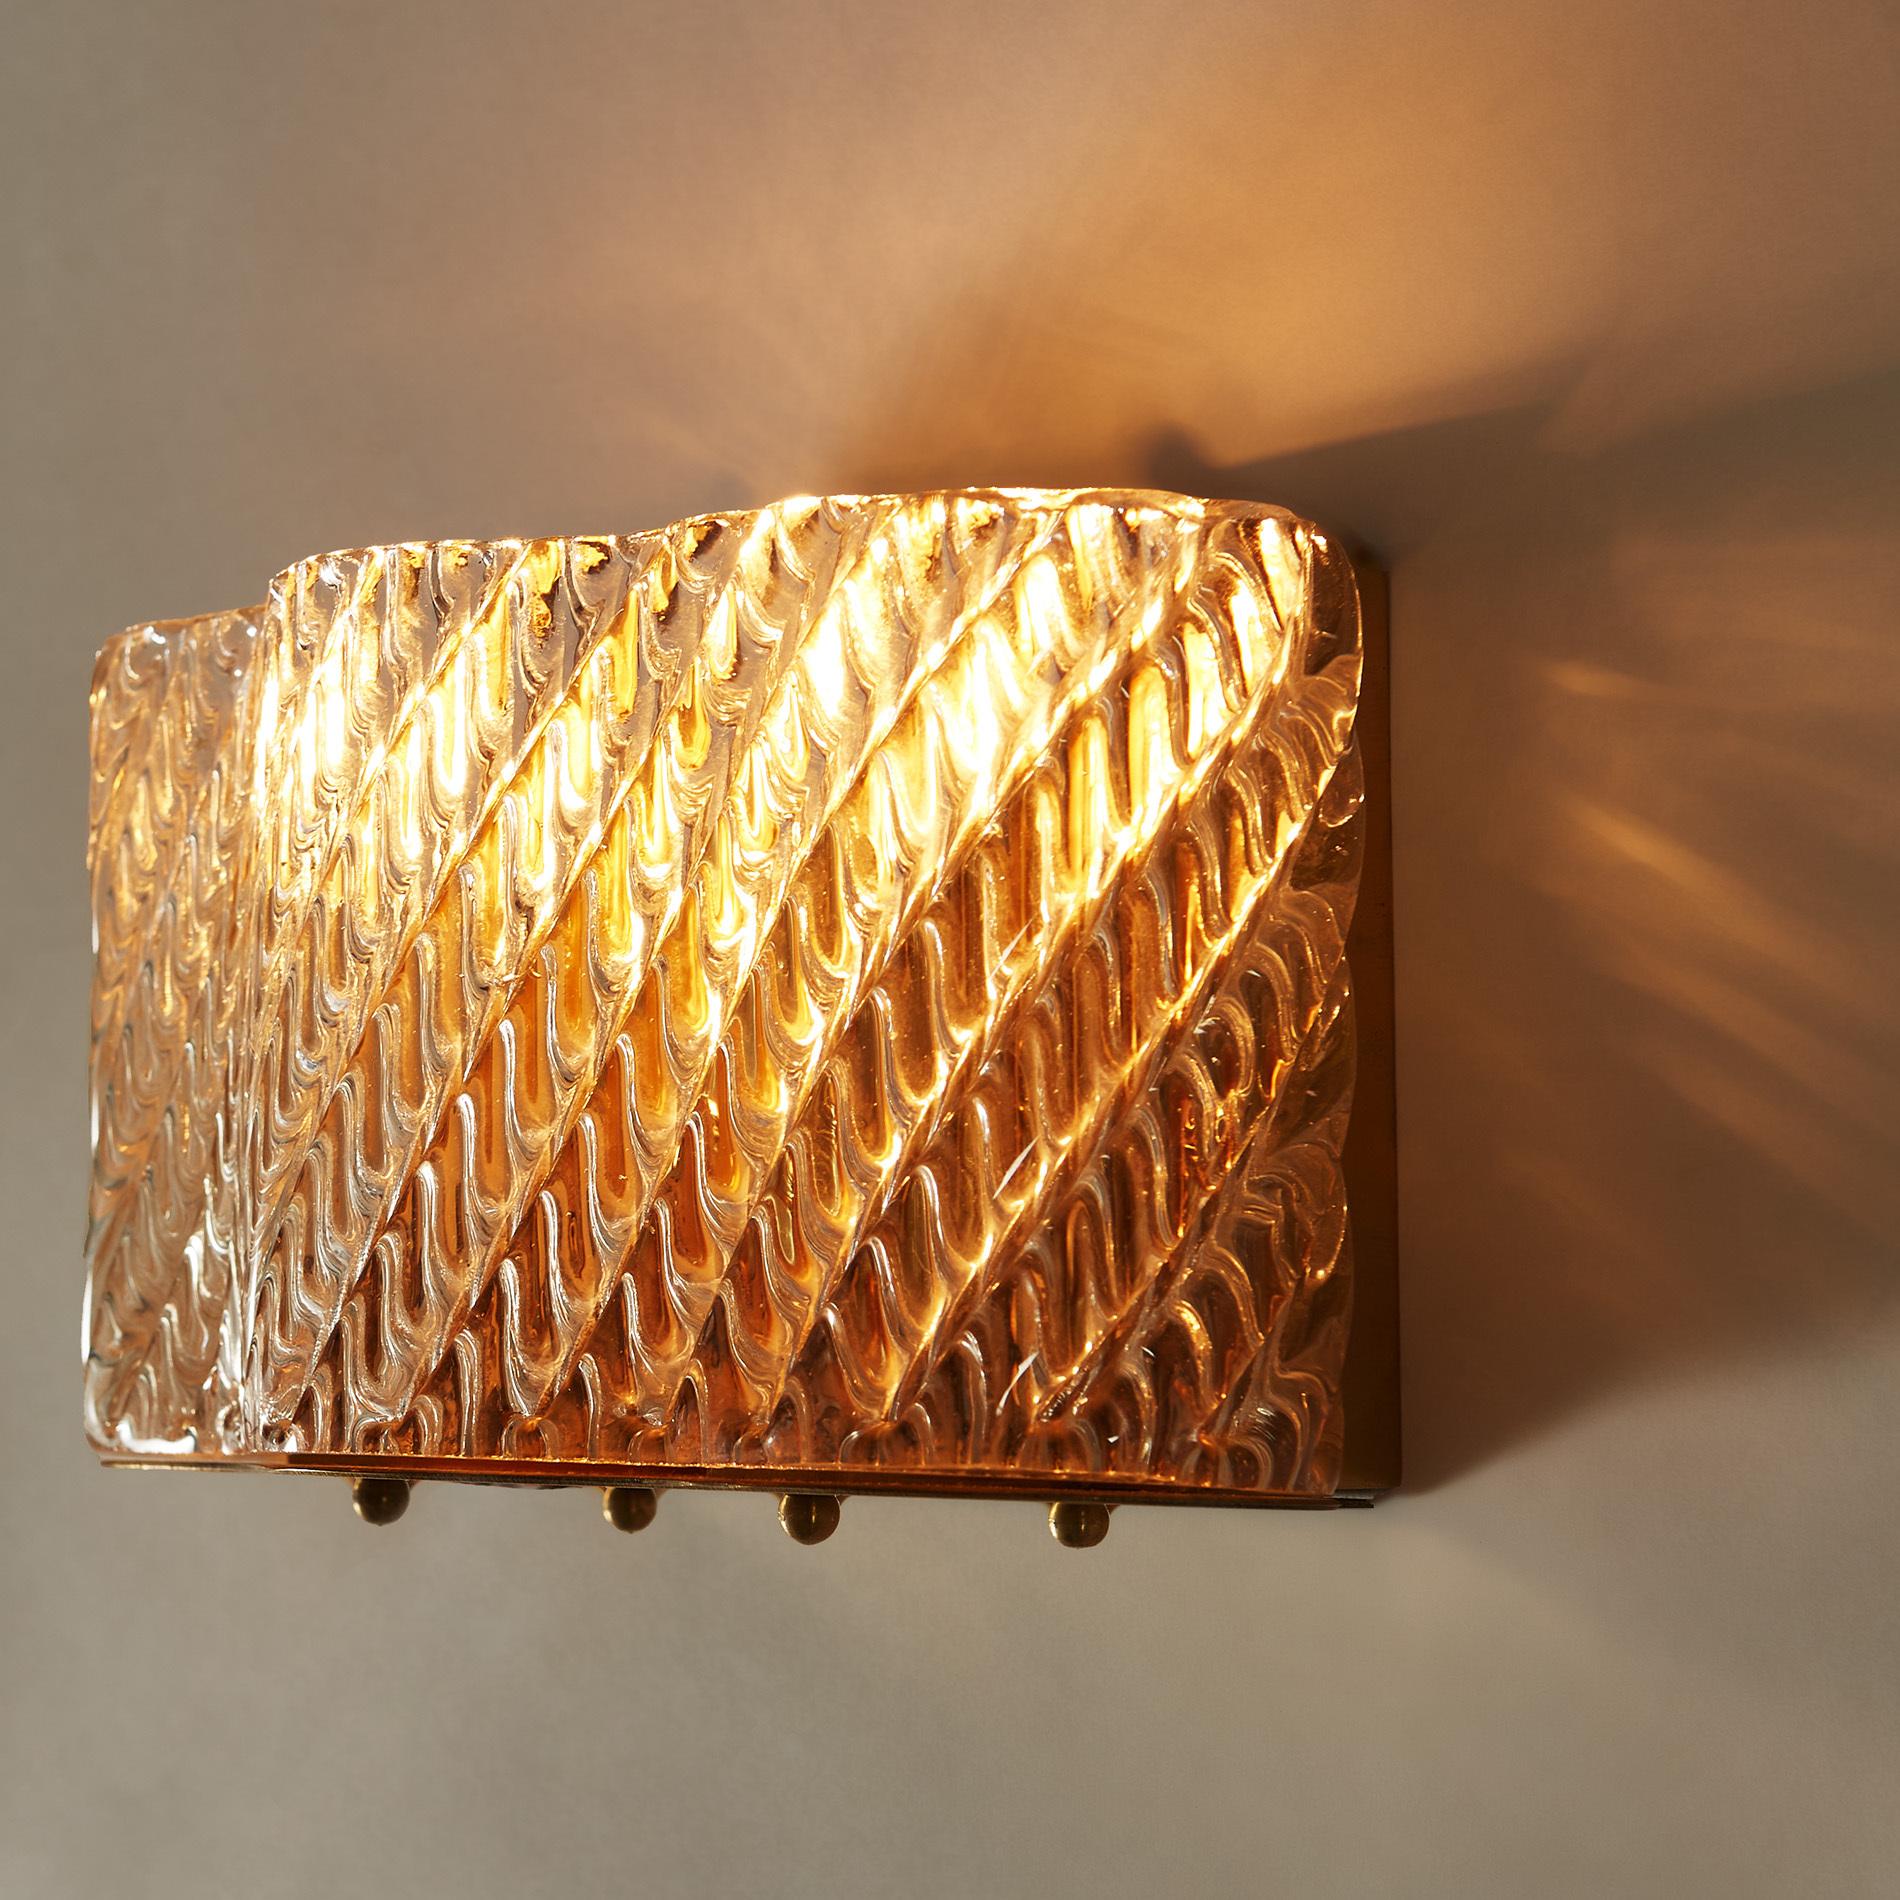 Seguso Diagonal Glass Wall Lights 20210427 Valerie Wade 4 0289 V1